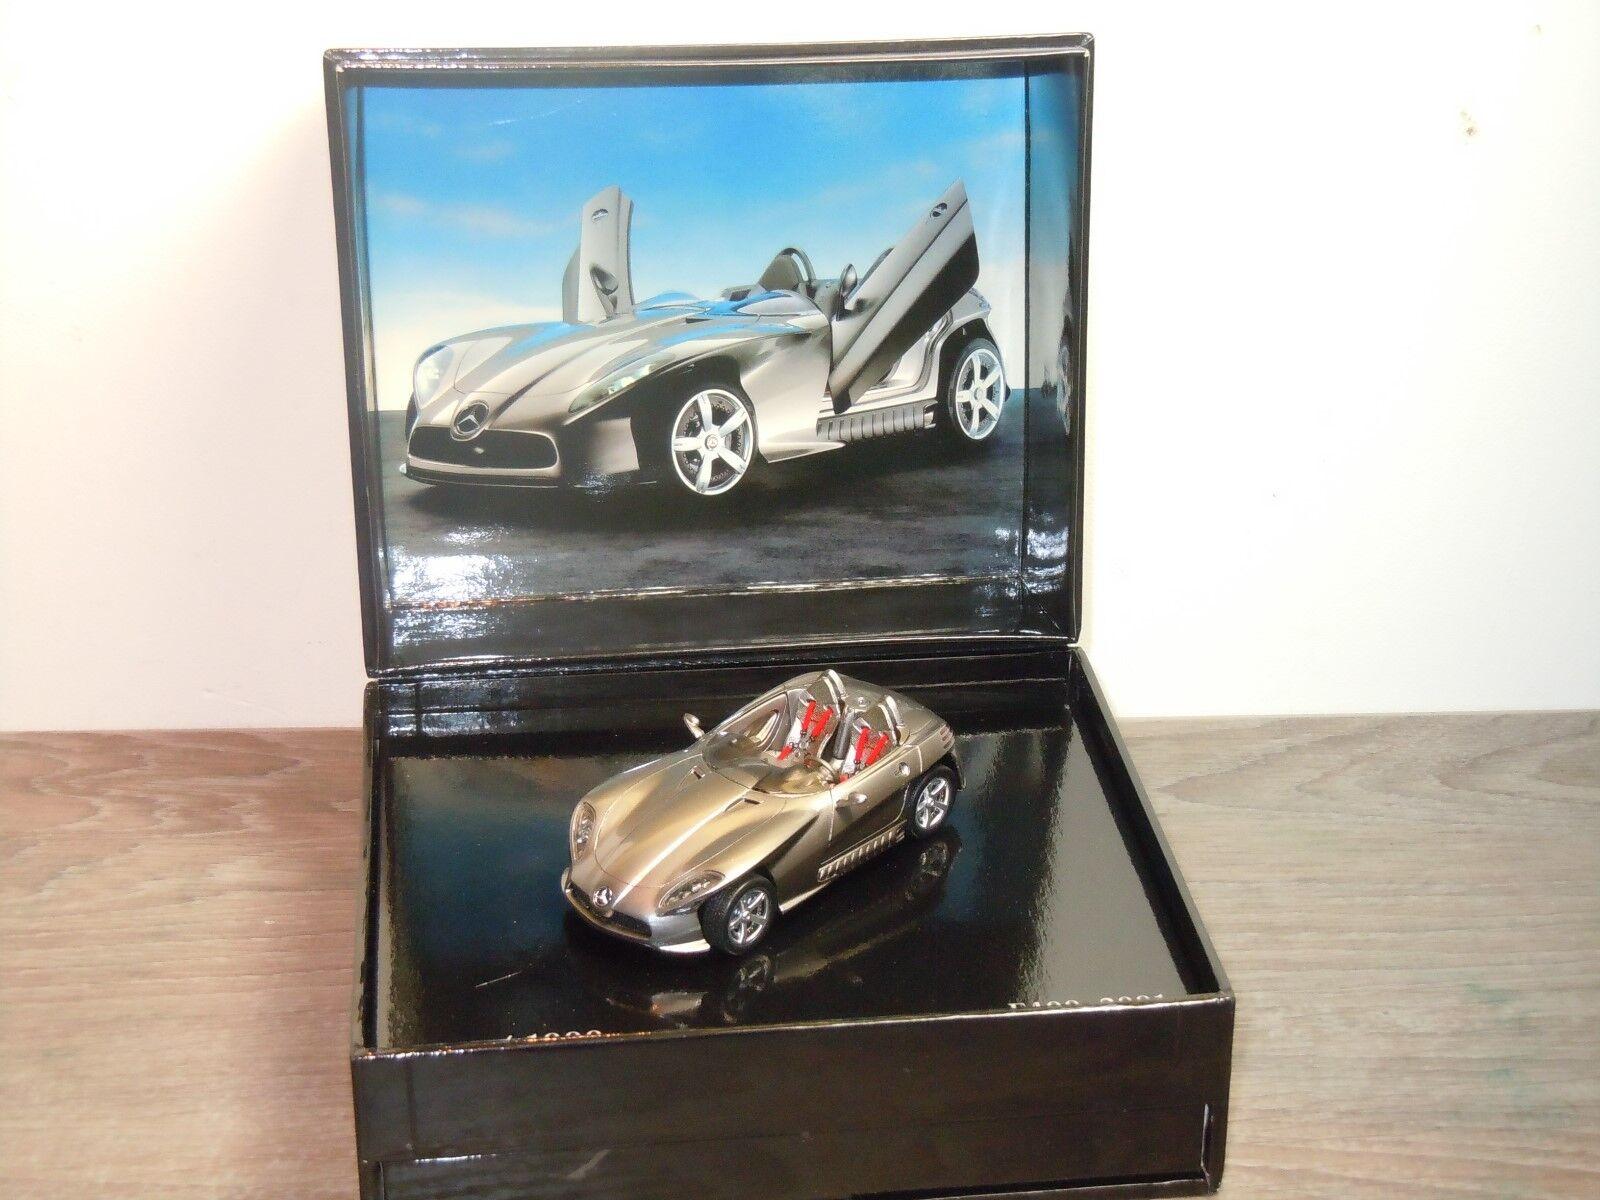 Mercedes F400 2001 - Spark 1 43 in Box 34905